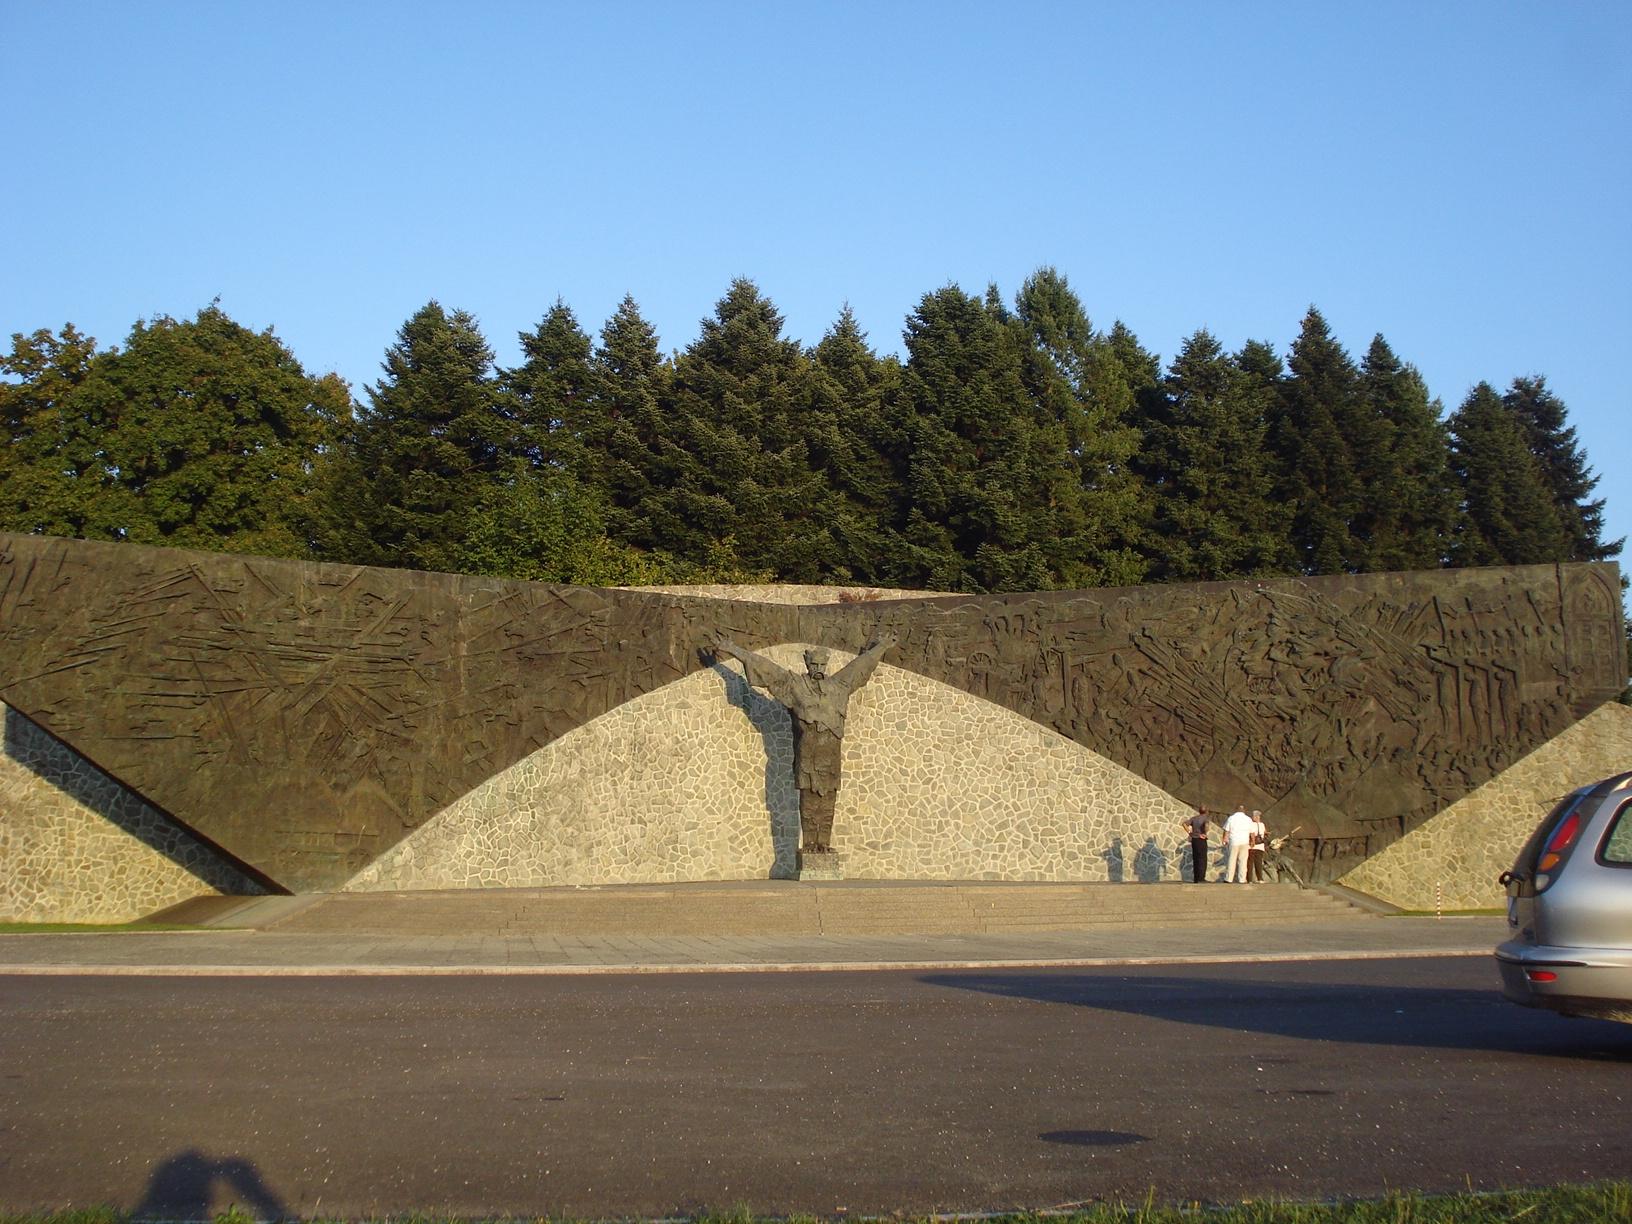 Datoteka Spomenik Seljackoj Buni 1573 Jpg Wikipedija